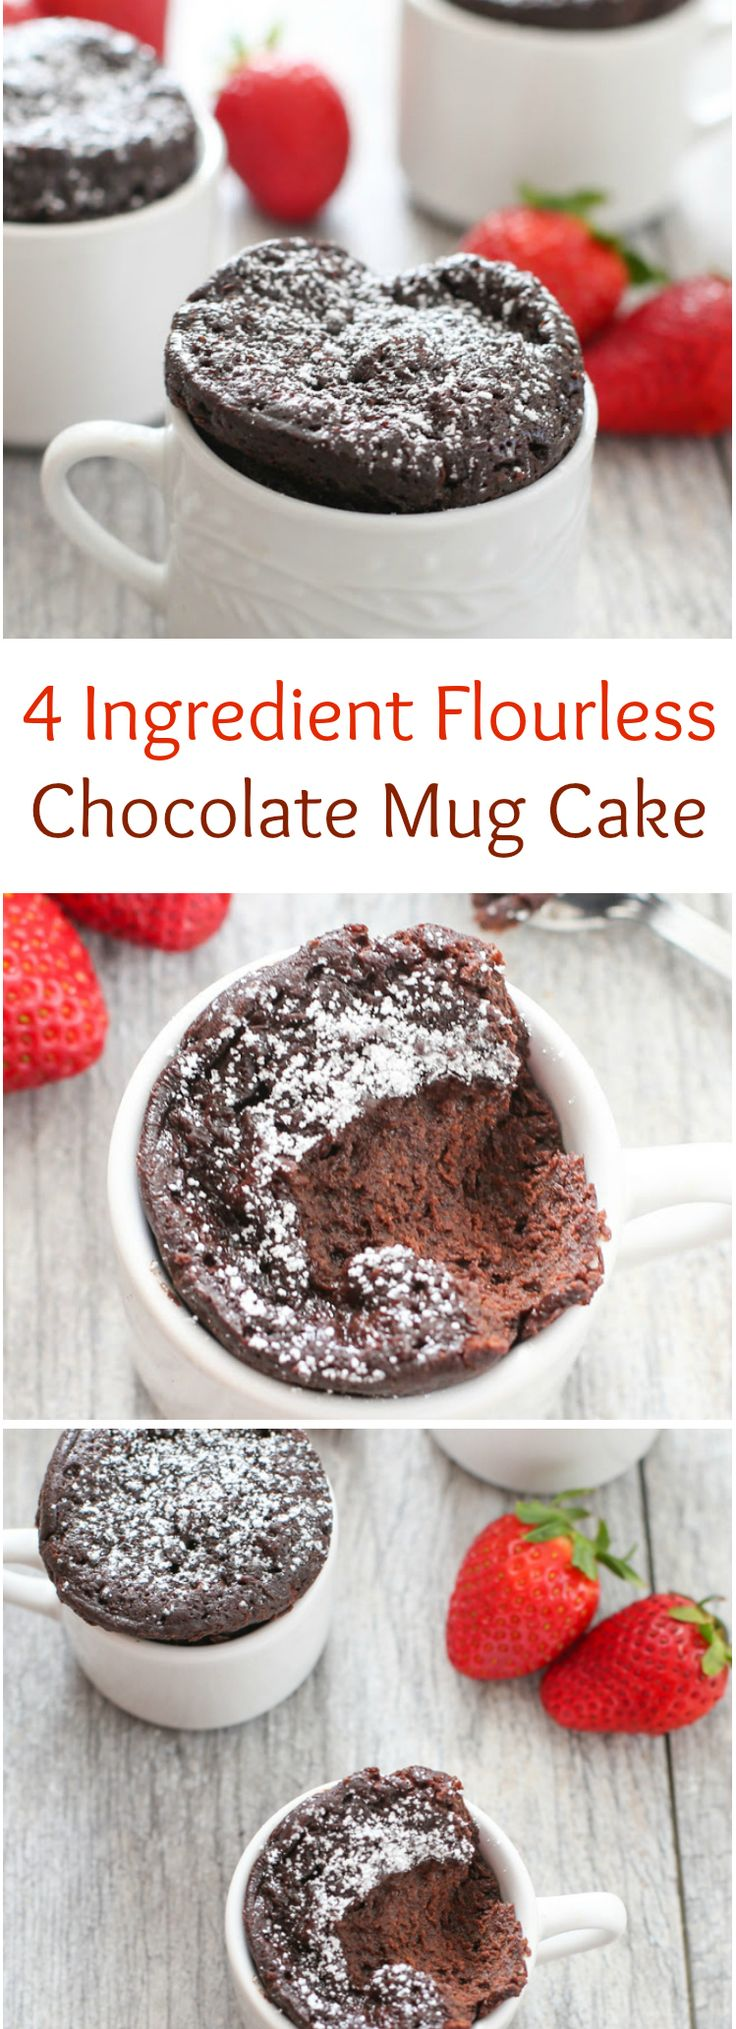 4 Ingredient Flourless Chocolate Mug Cake